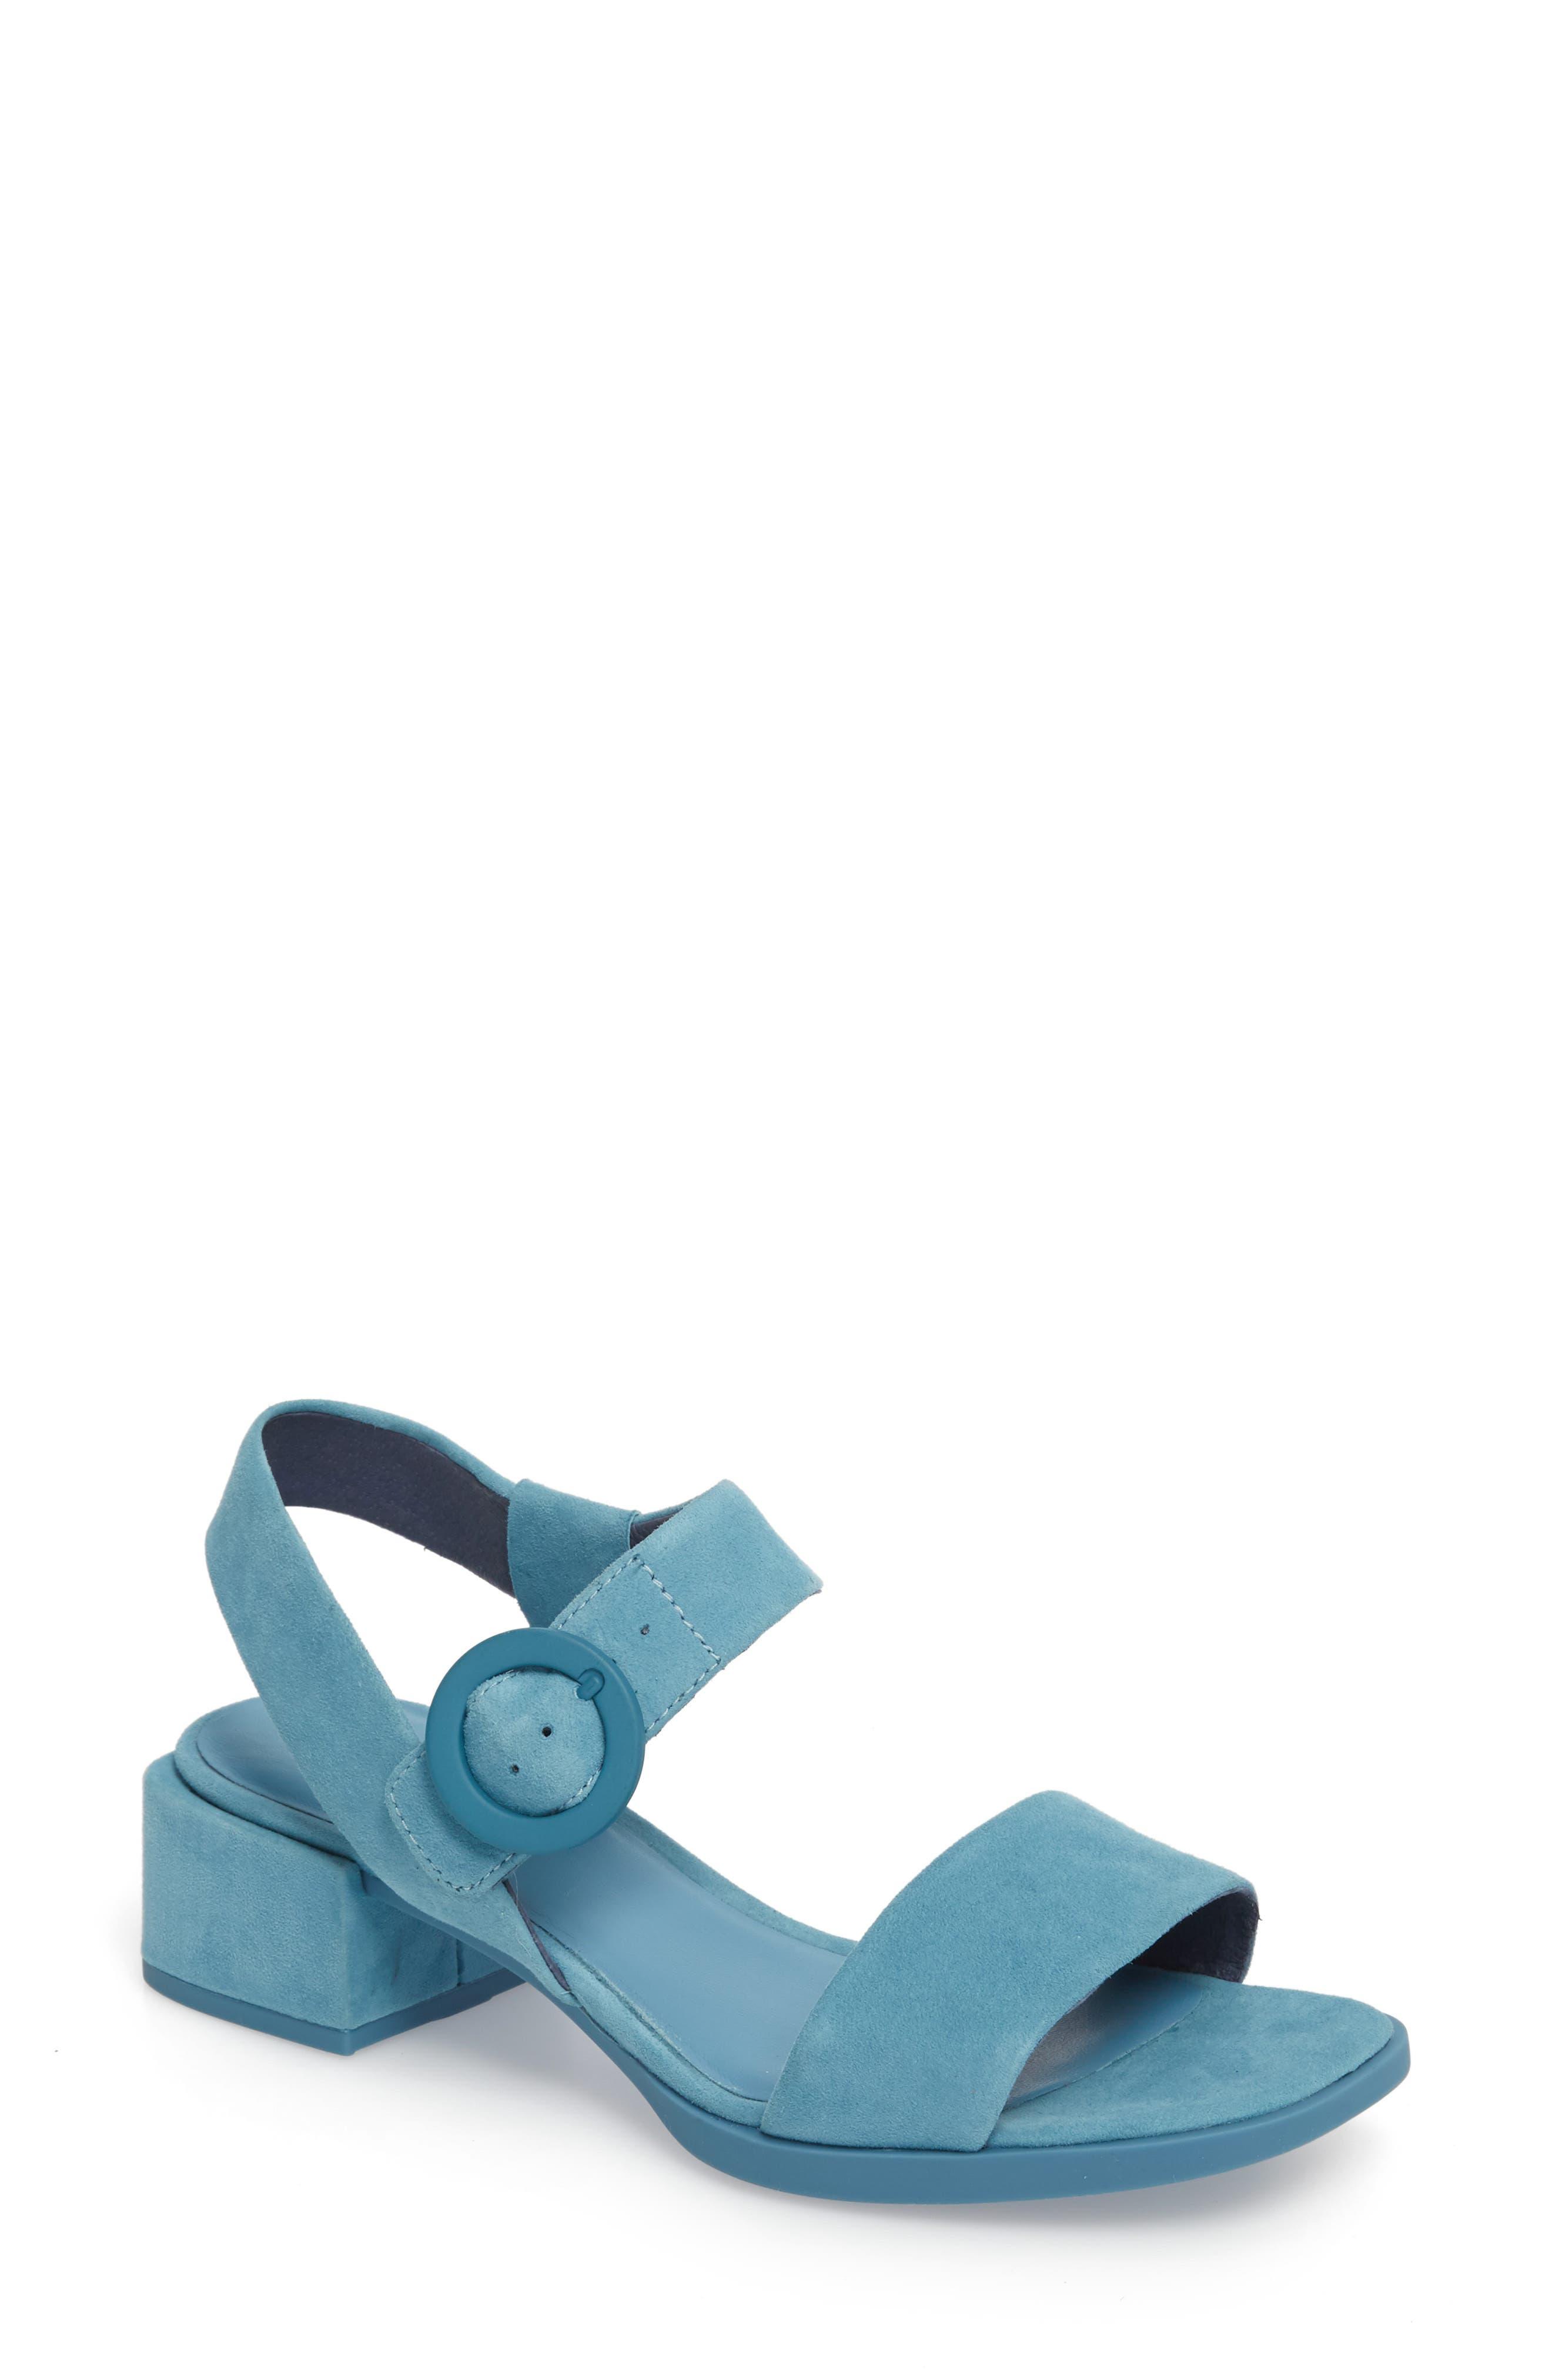 Kobo Sandal,                         Main,                         color,